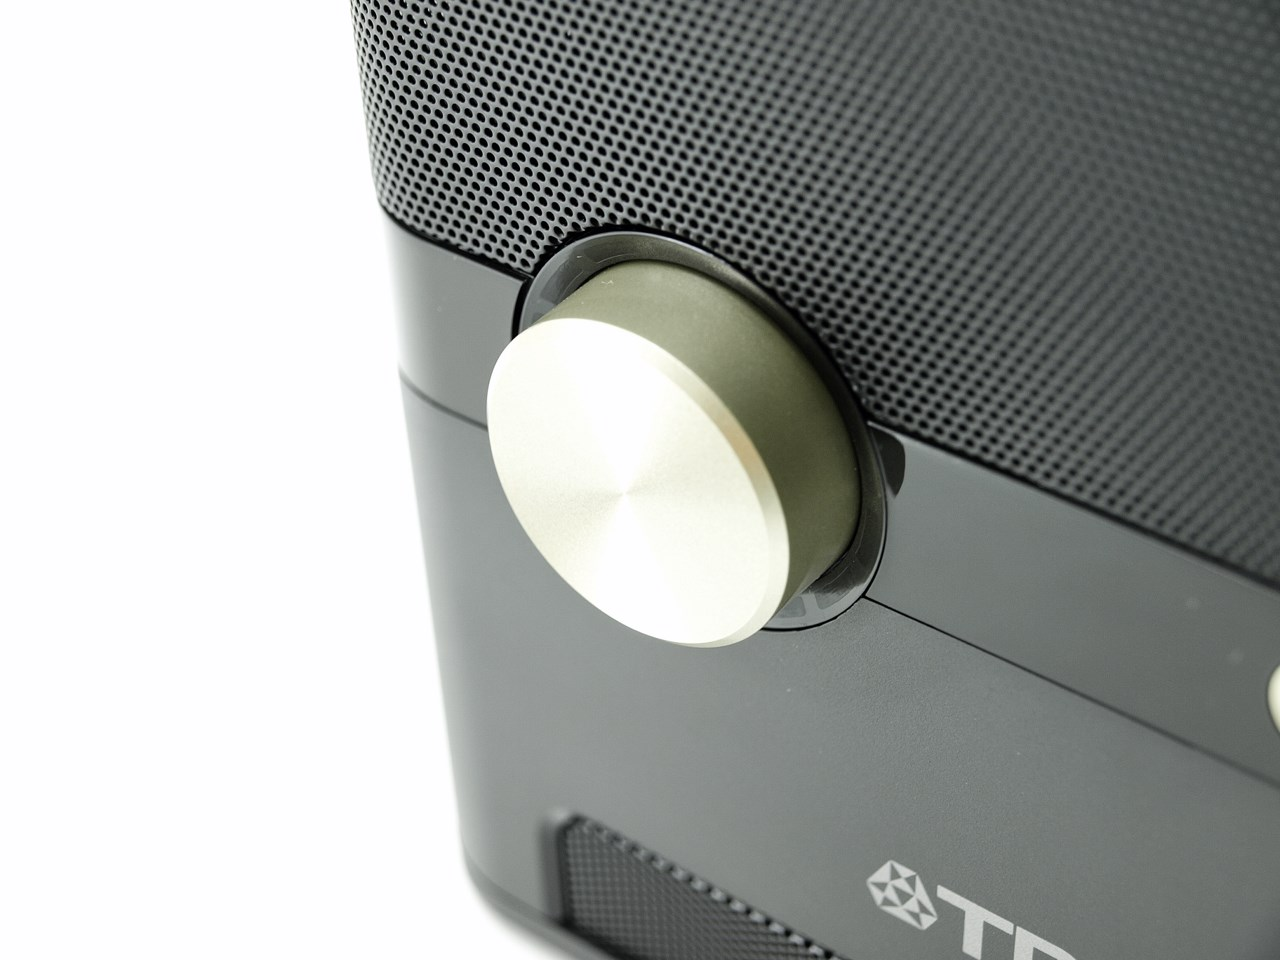 tdk bluetooth speaker instructions